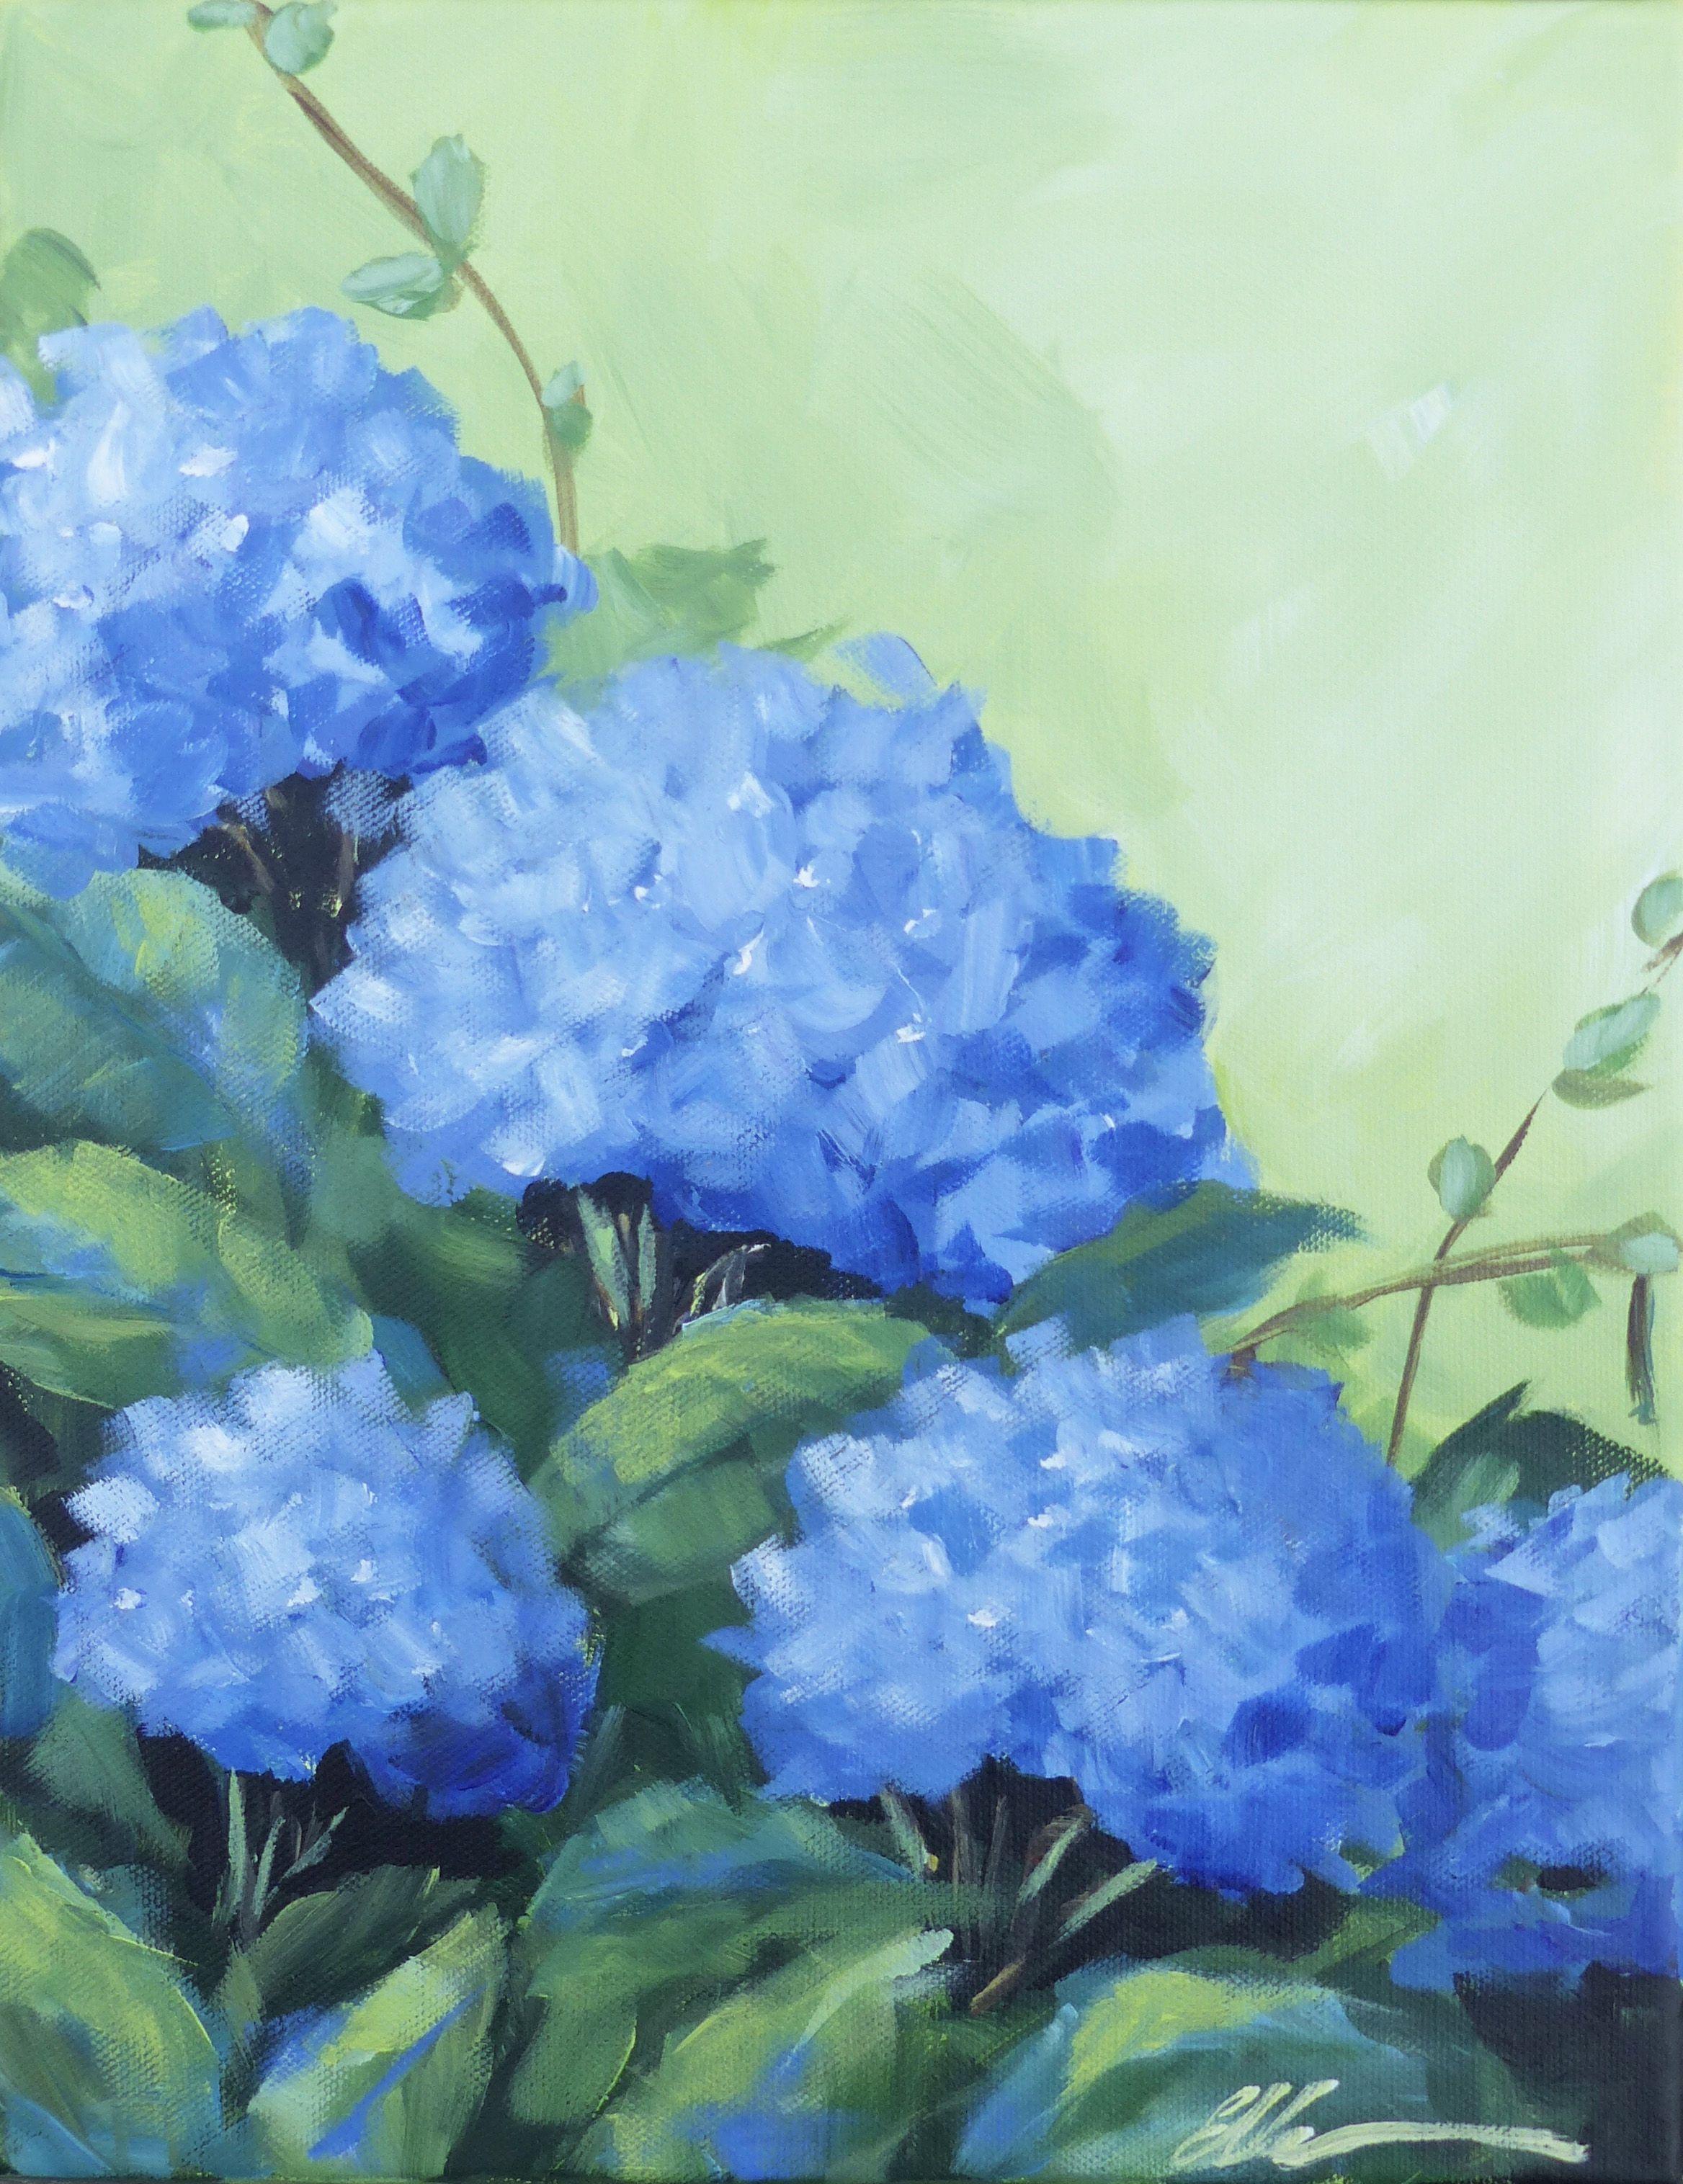 Blue Hydrangeas Flower Painting Floral Painting Flower Prints Art